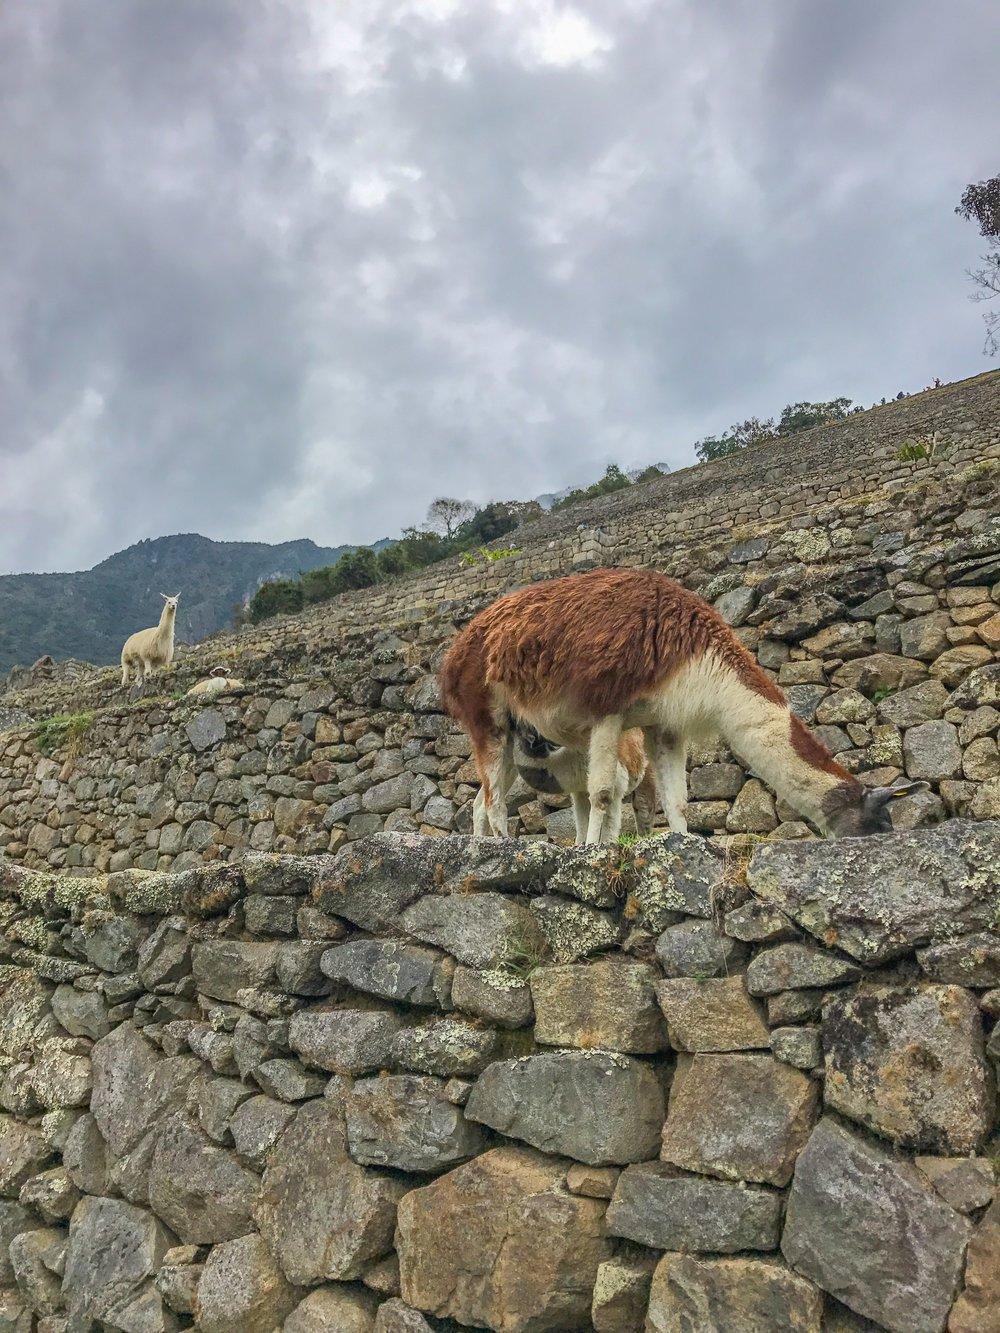 The famous Machu Picchu llamas